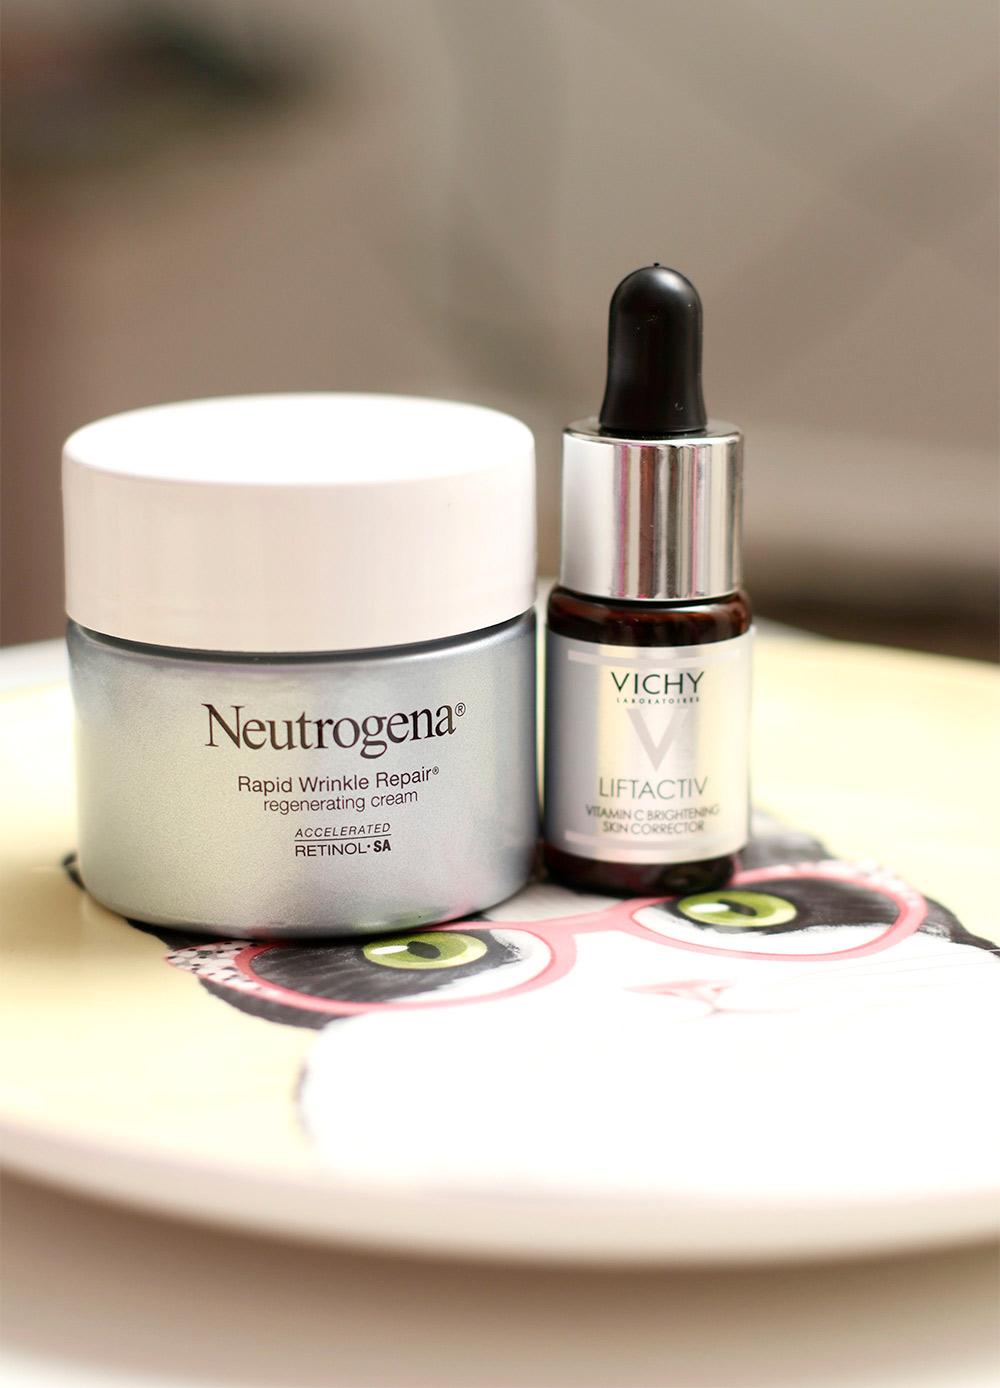 Review Serum Dr Pure : review, serum, Budget, Anti-Aging, Haul:, Retinol, Cream,, Vitamin, Serum, Niacinamide, Night, Cream, (Each, Less!), Makeup, Beauty